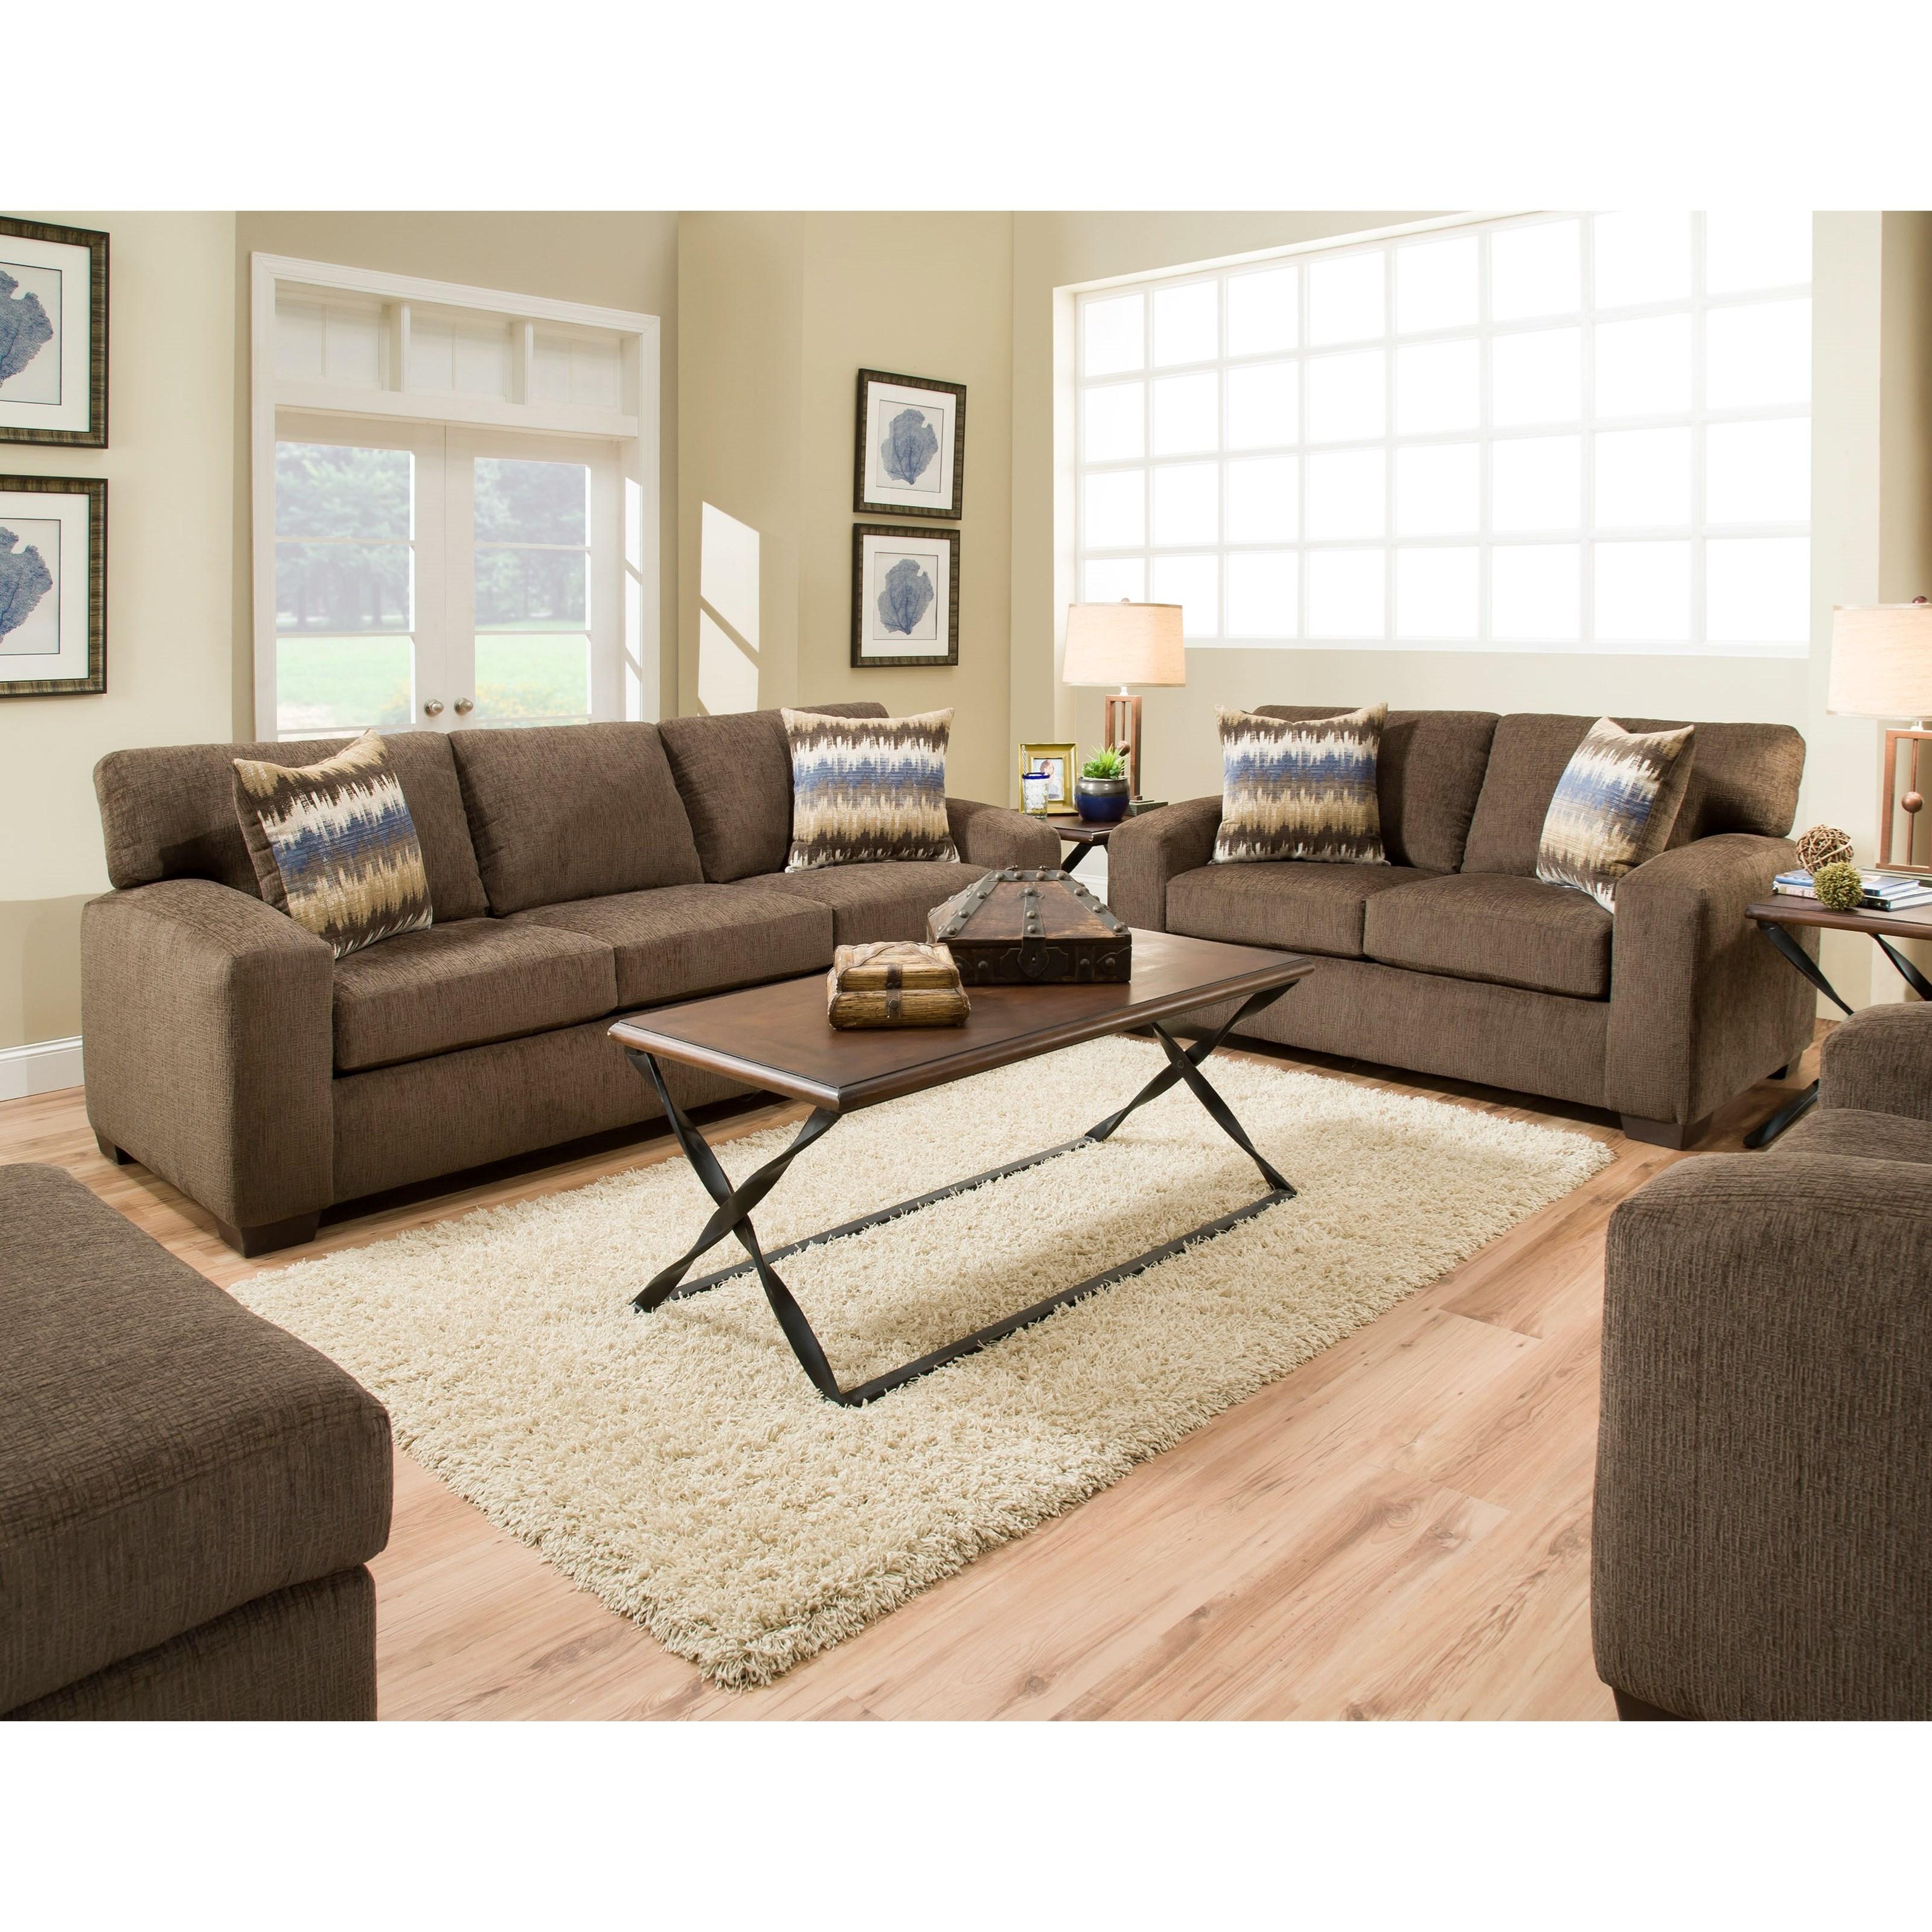 Prime Brothers Furniture Home fice Desk Furniture Bar Stools